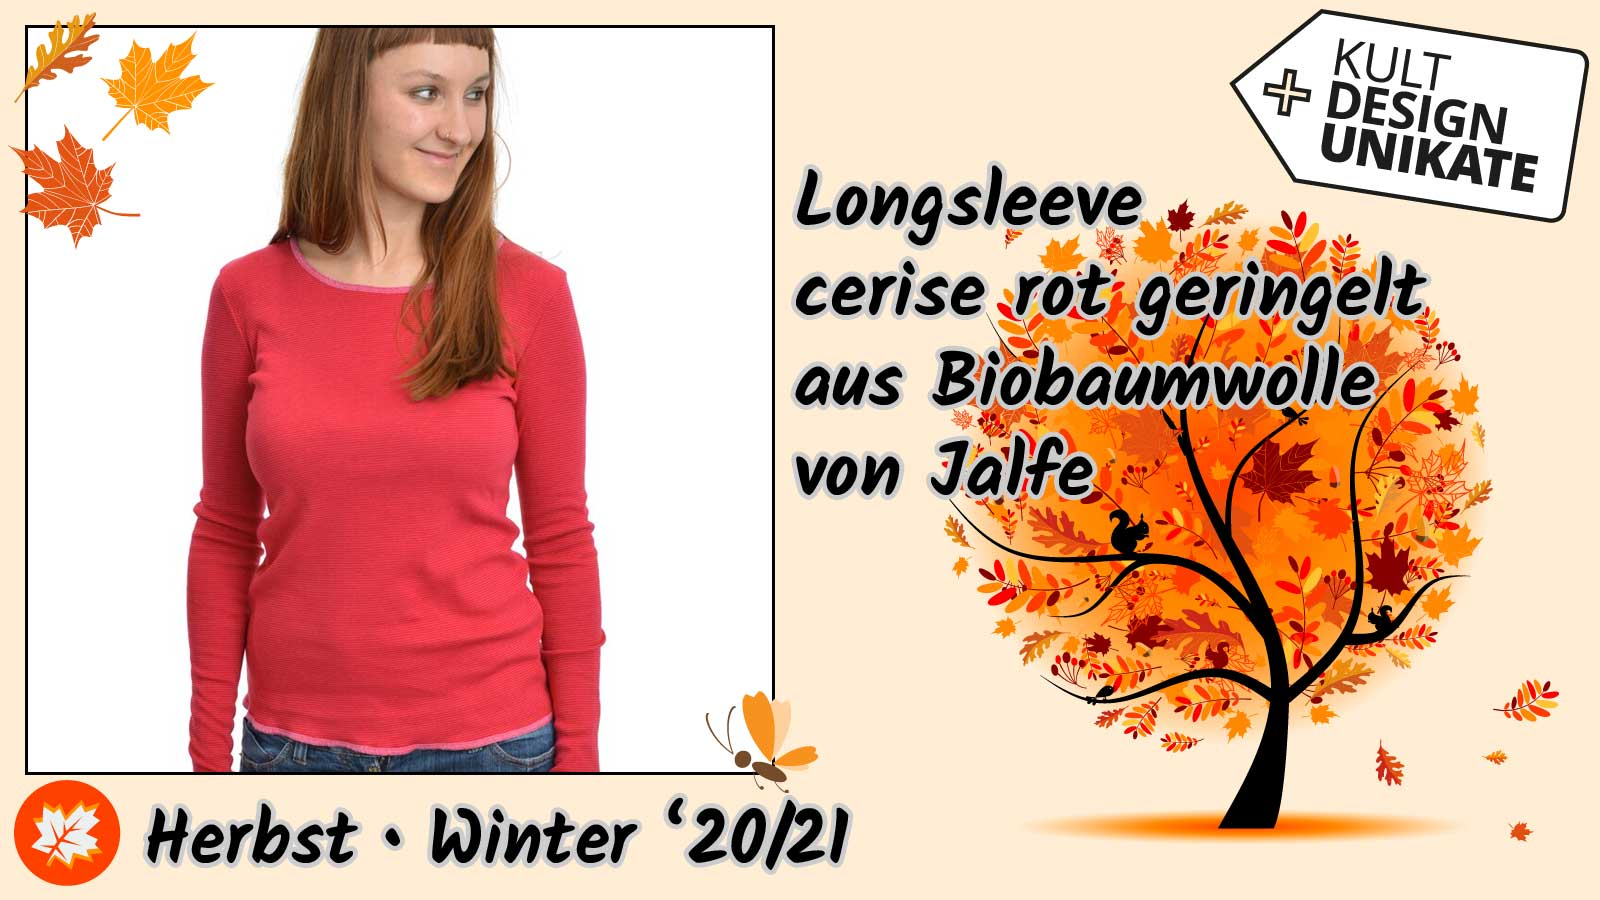 Jalfe-Longsleeve-cerise-rot-geringelt